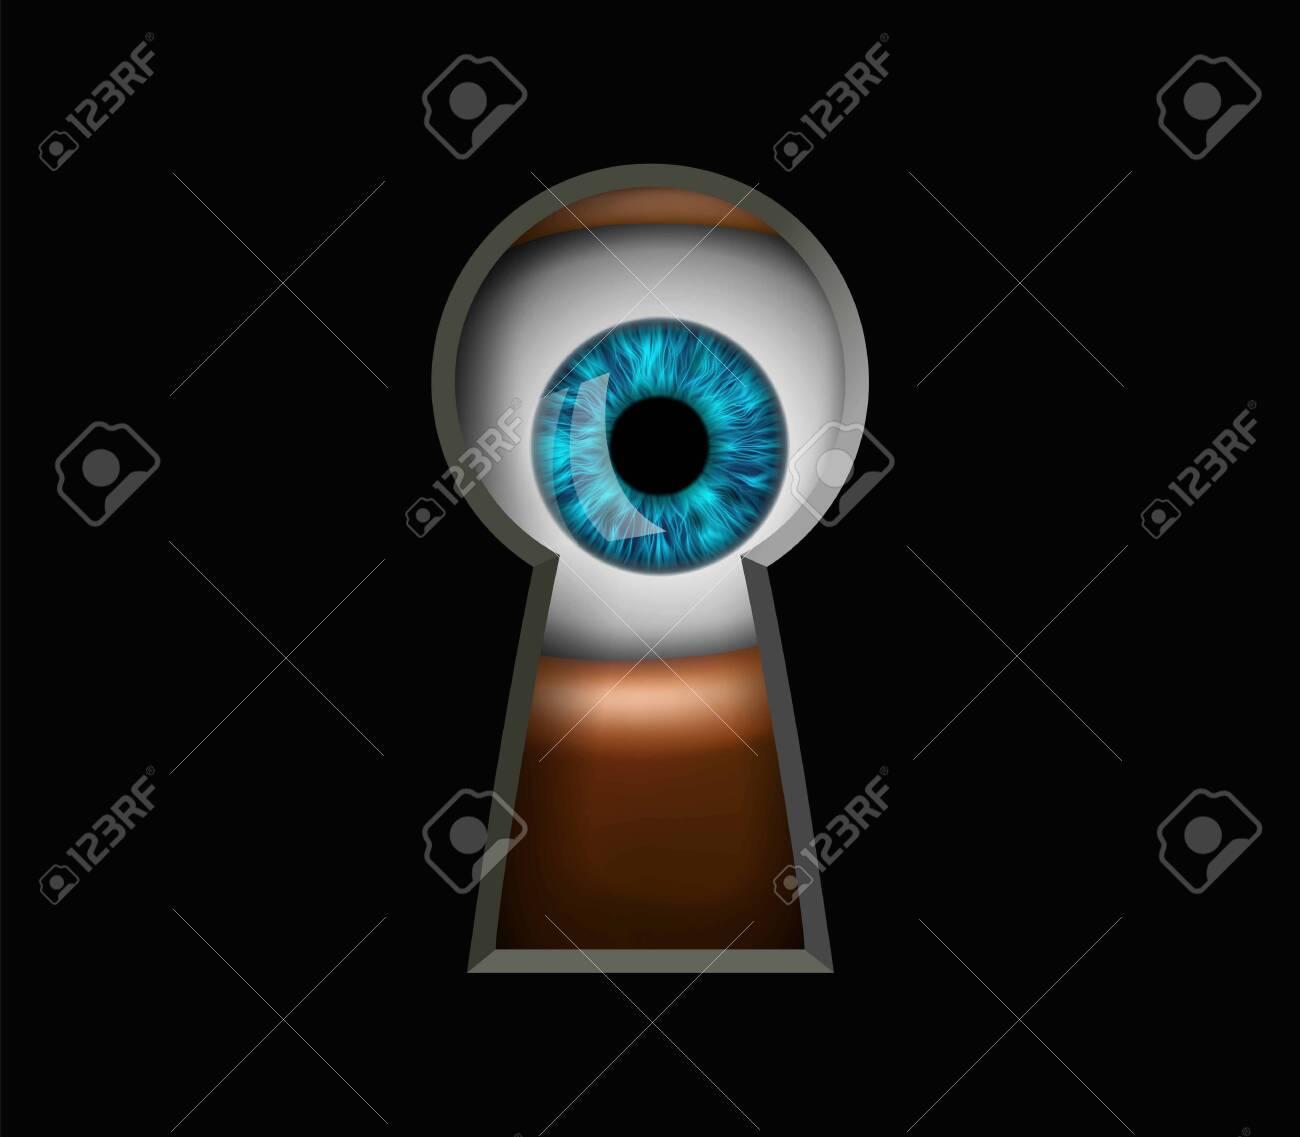 Human eye looking through a keyhole. Peeping and curiosity. Vector illustration. - 152014919